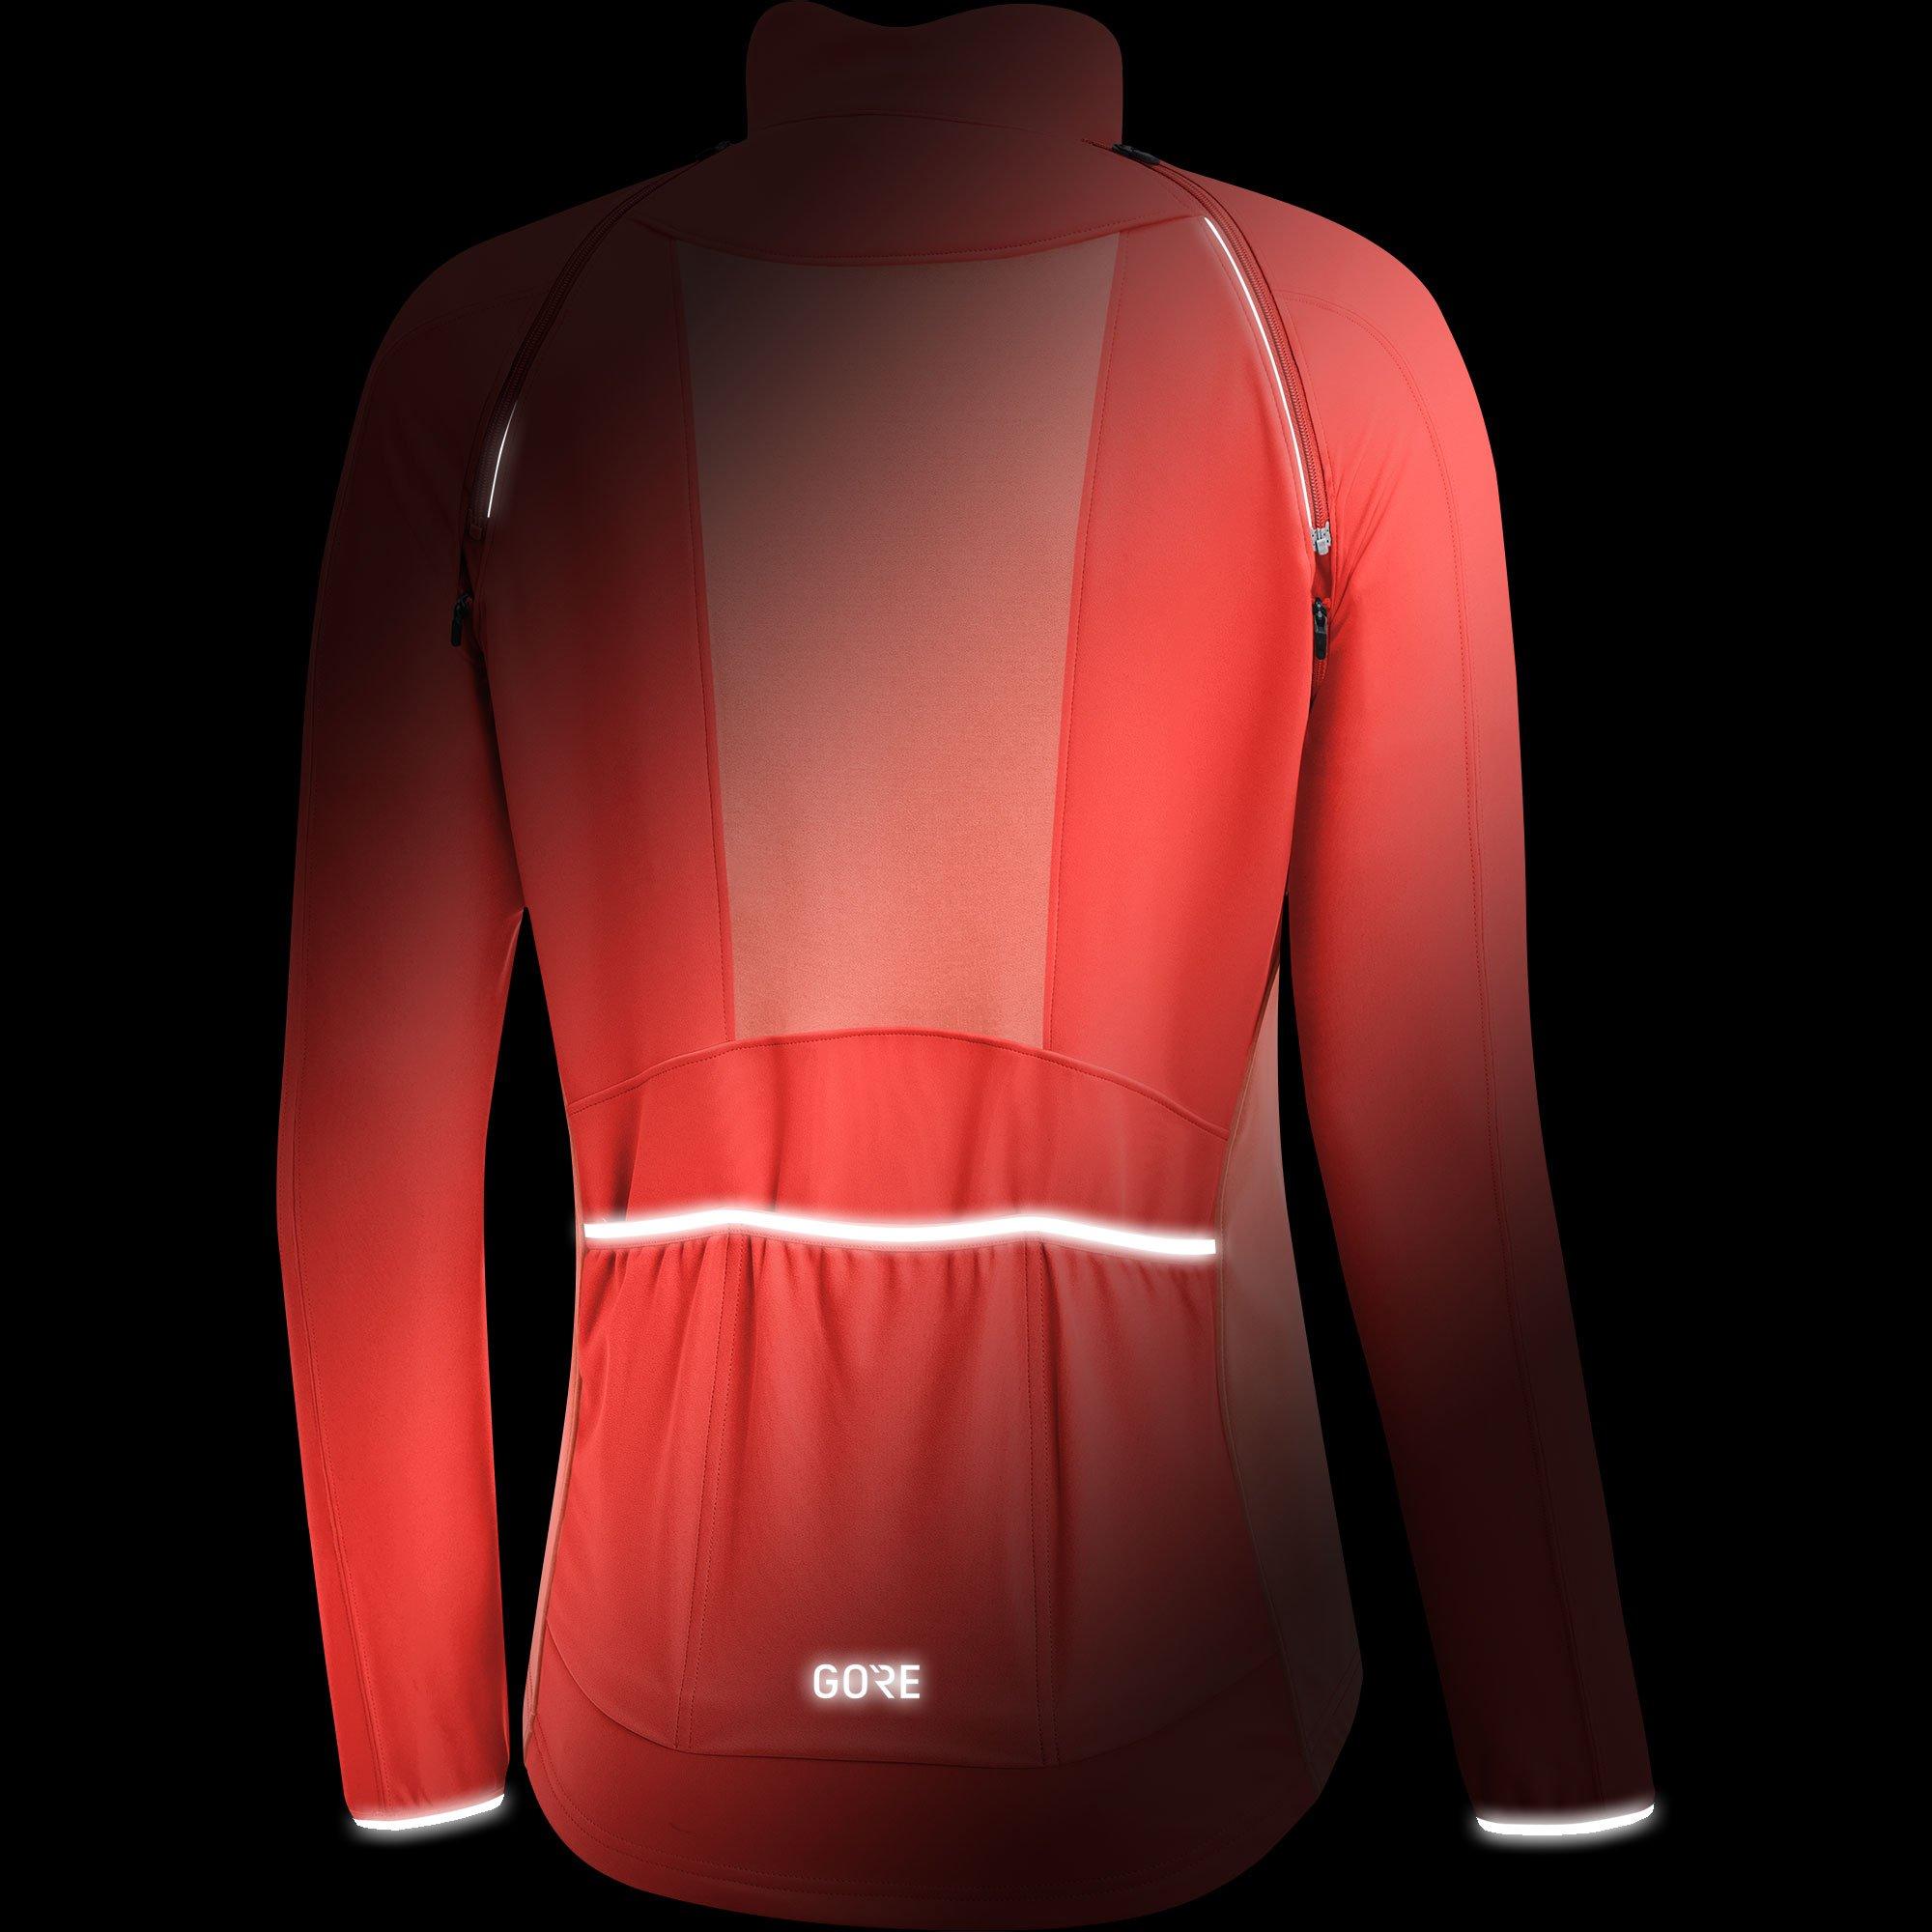 GORE Wear Women's Windproof Cycling Jacket, Removable Sleeves, GORE Wear C3 Women's GORE Wear WINDSTOPPER Phantom Zip-Off Jacket, Size: L, Color: Lumi Orange/Coral Glow, 100191 by GORE WEAR (Image #4)